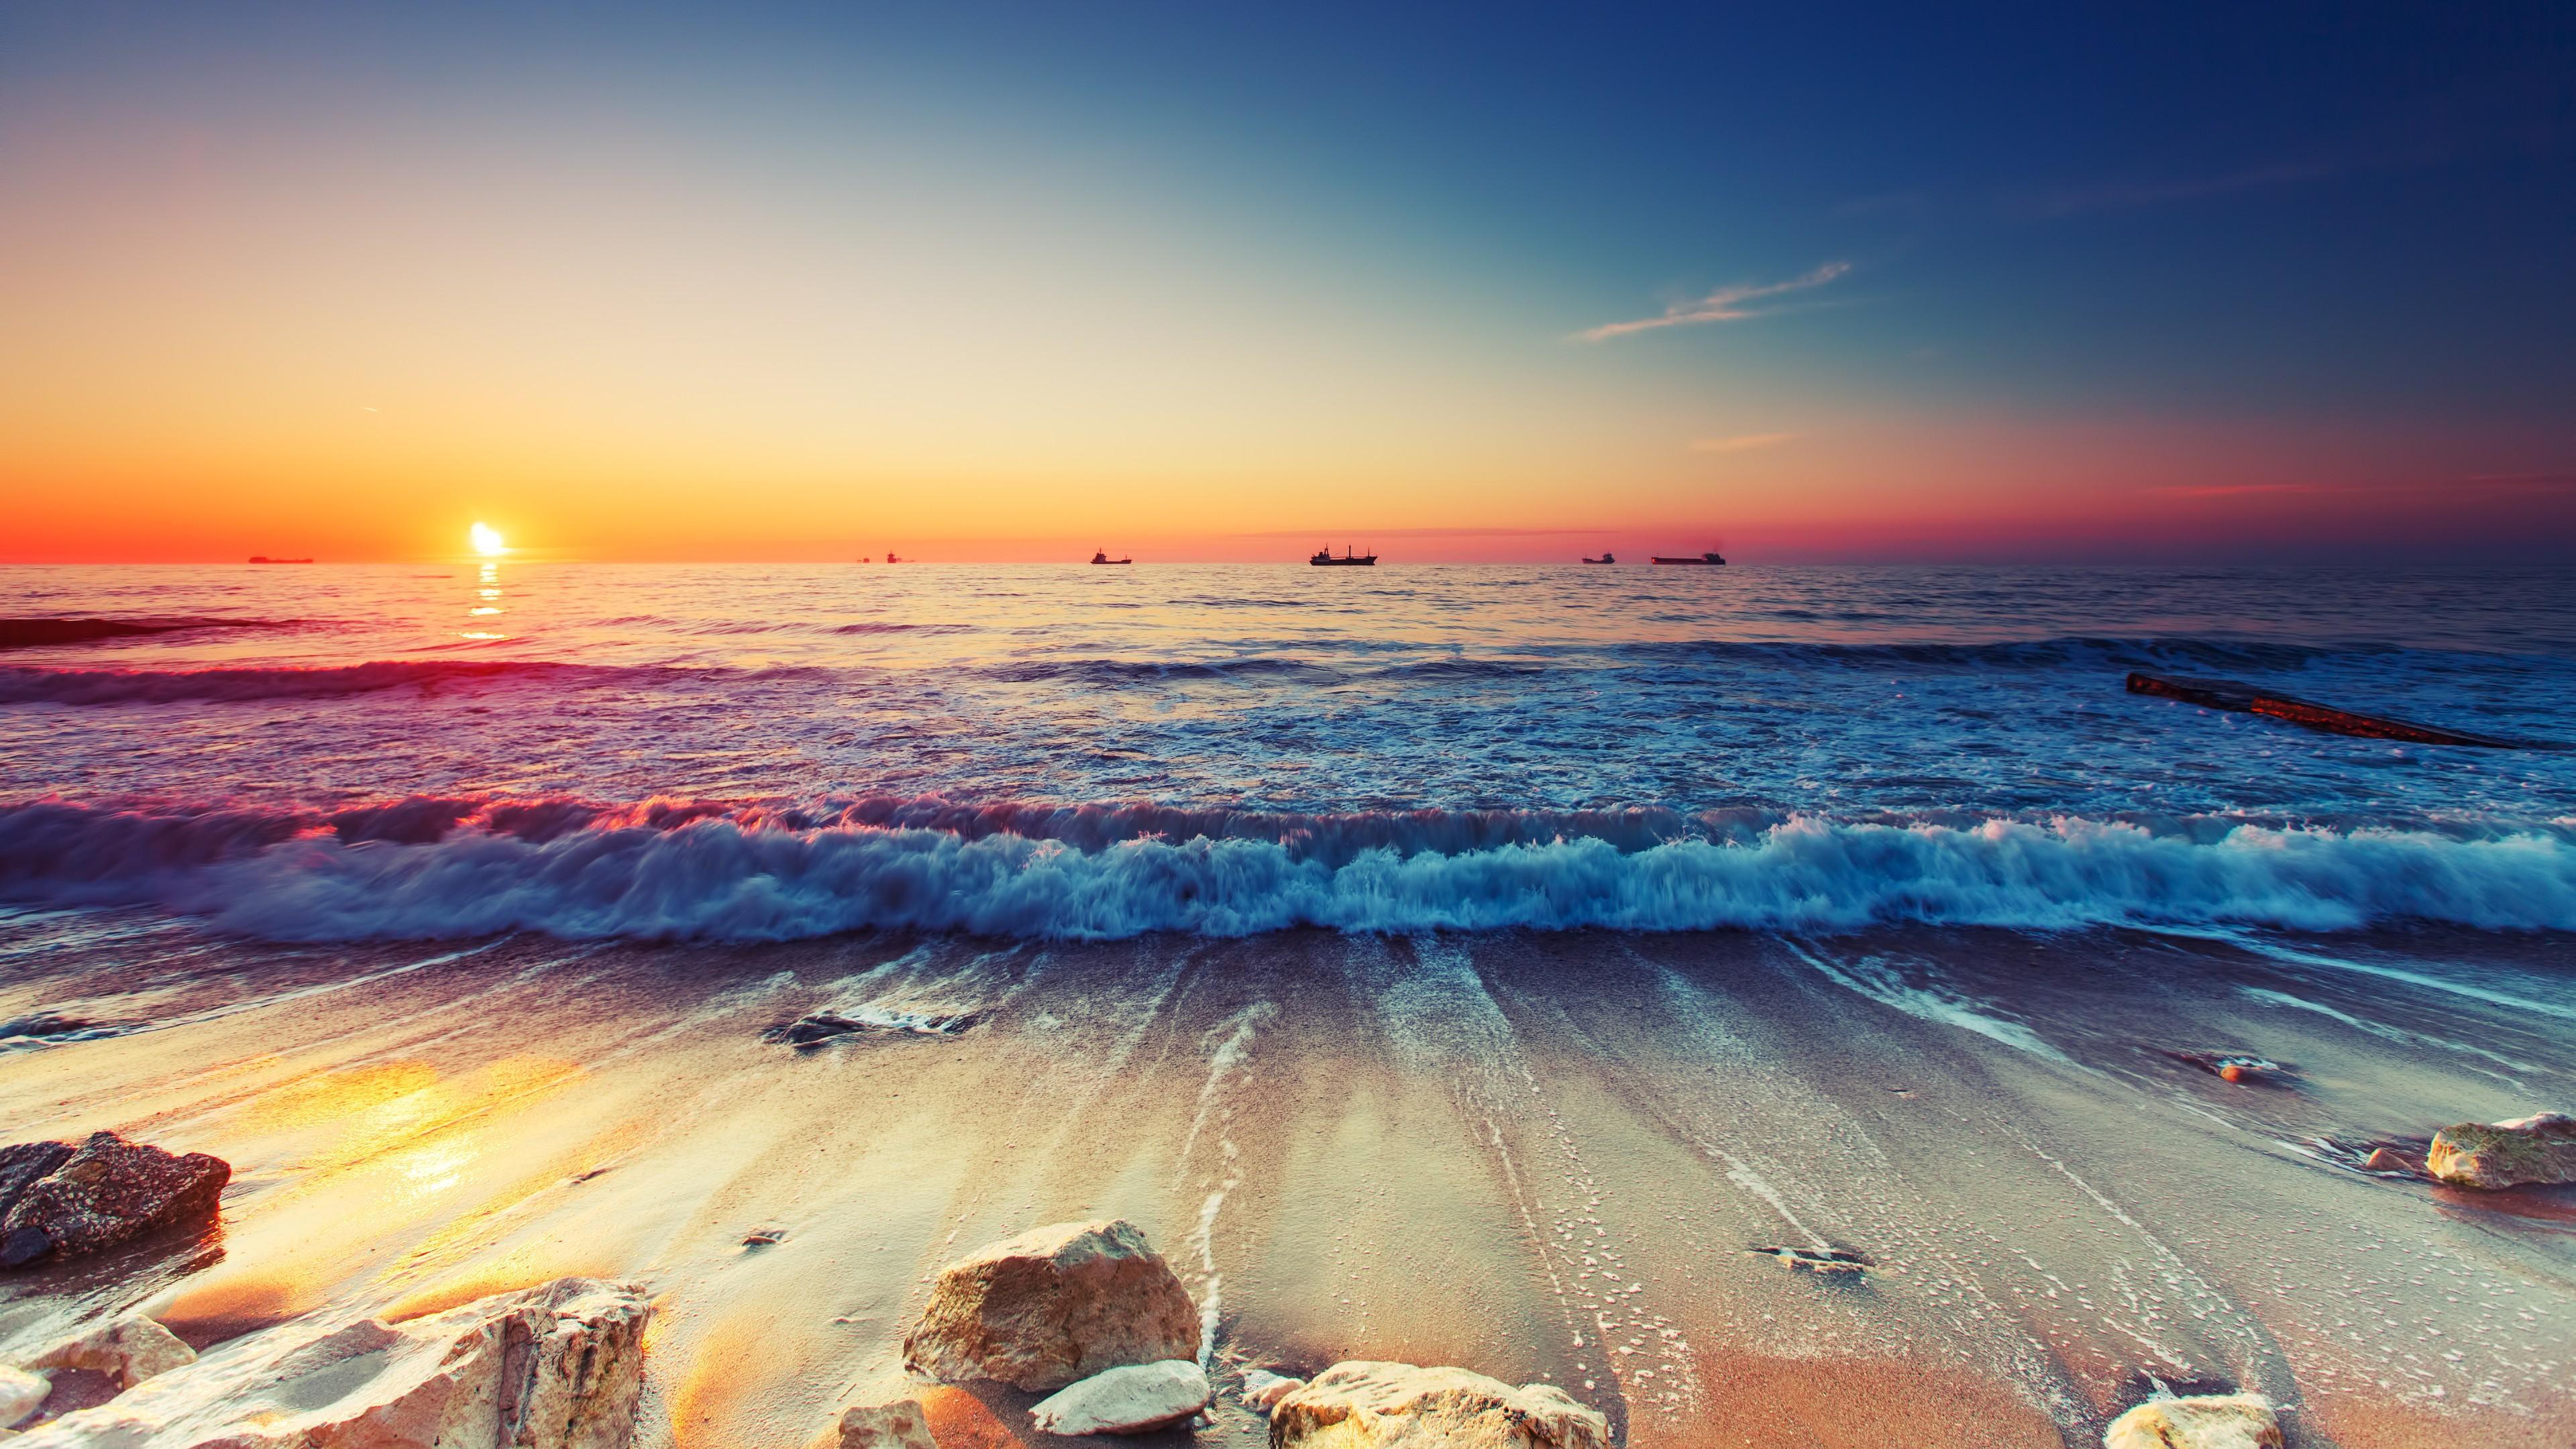 Summer Beach Scene 4k Hd Desktop Wallpaper For 4k Ultra Hd: Waves, HD Nature, 4k Wallpapers, Images, Backgrounds